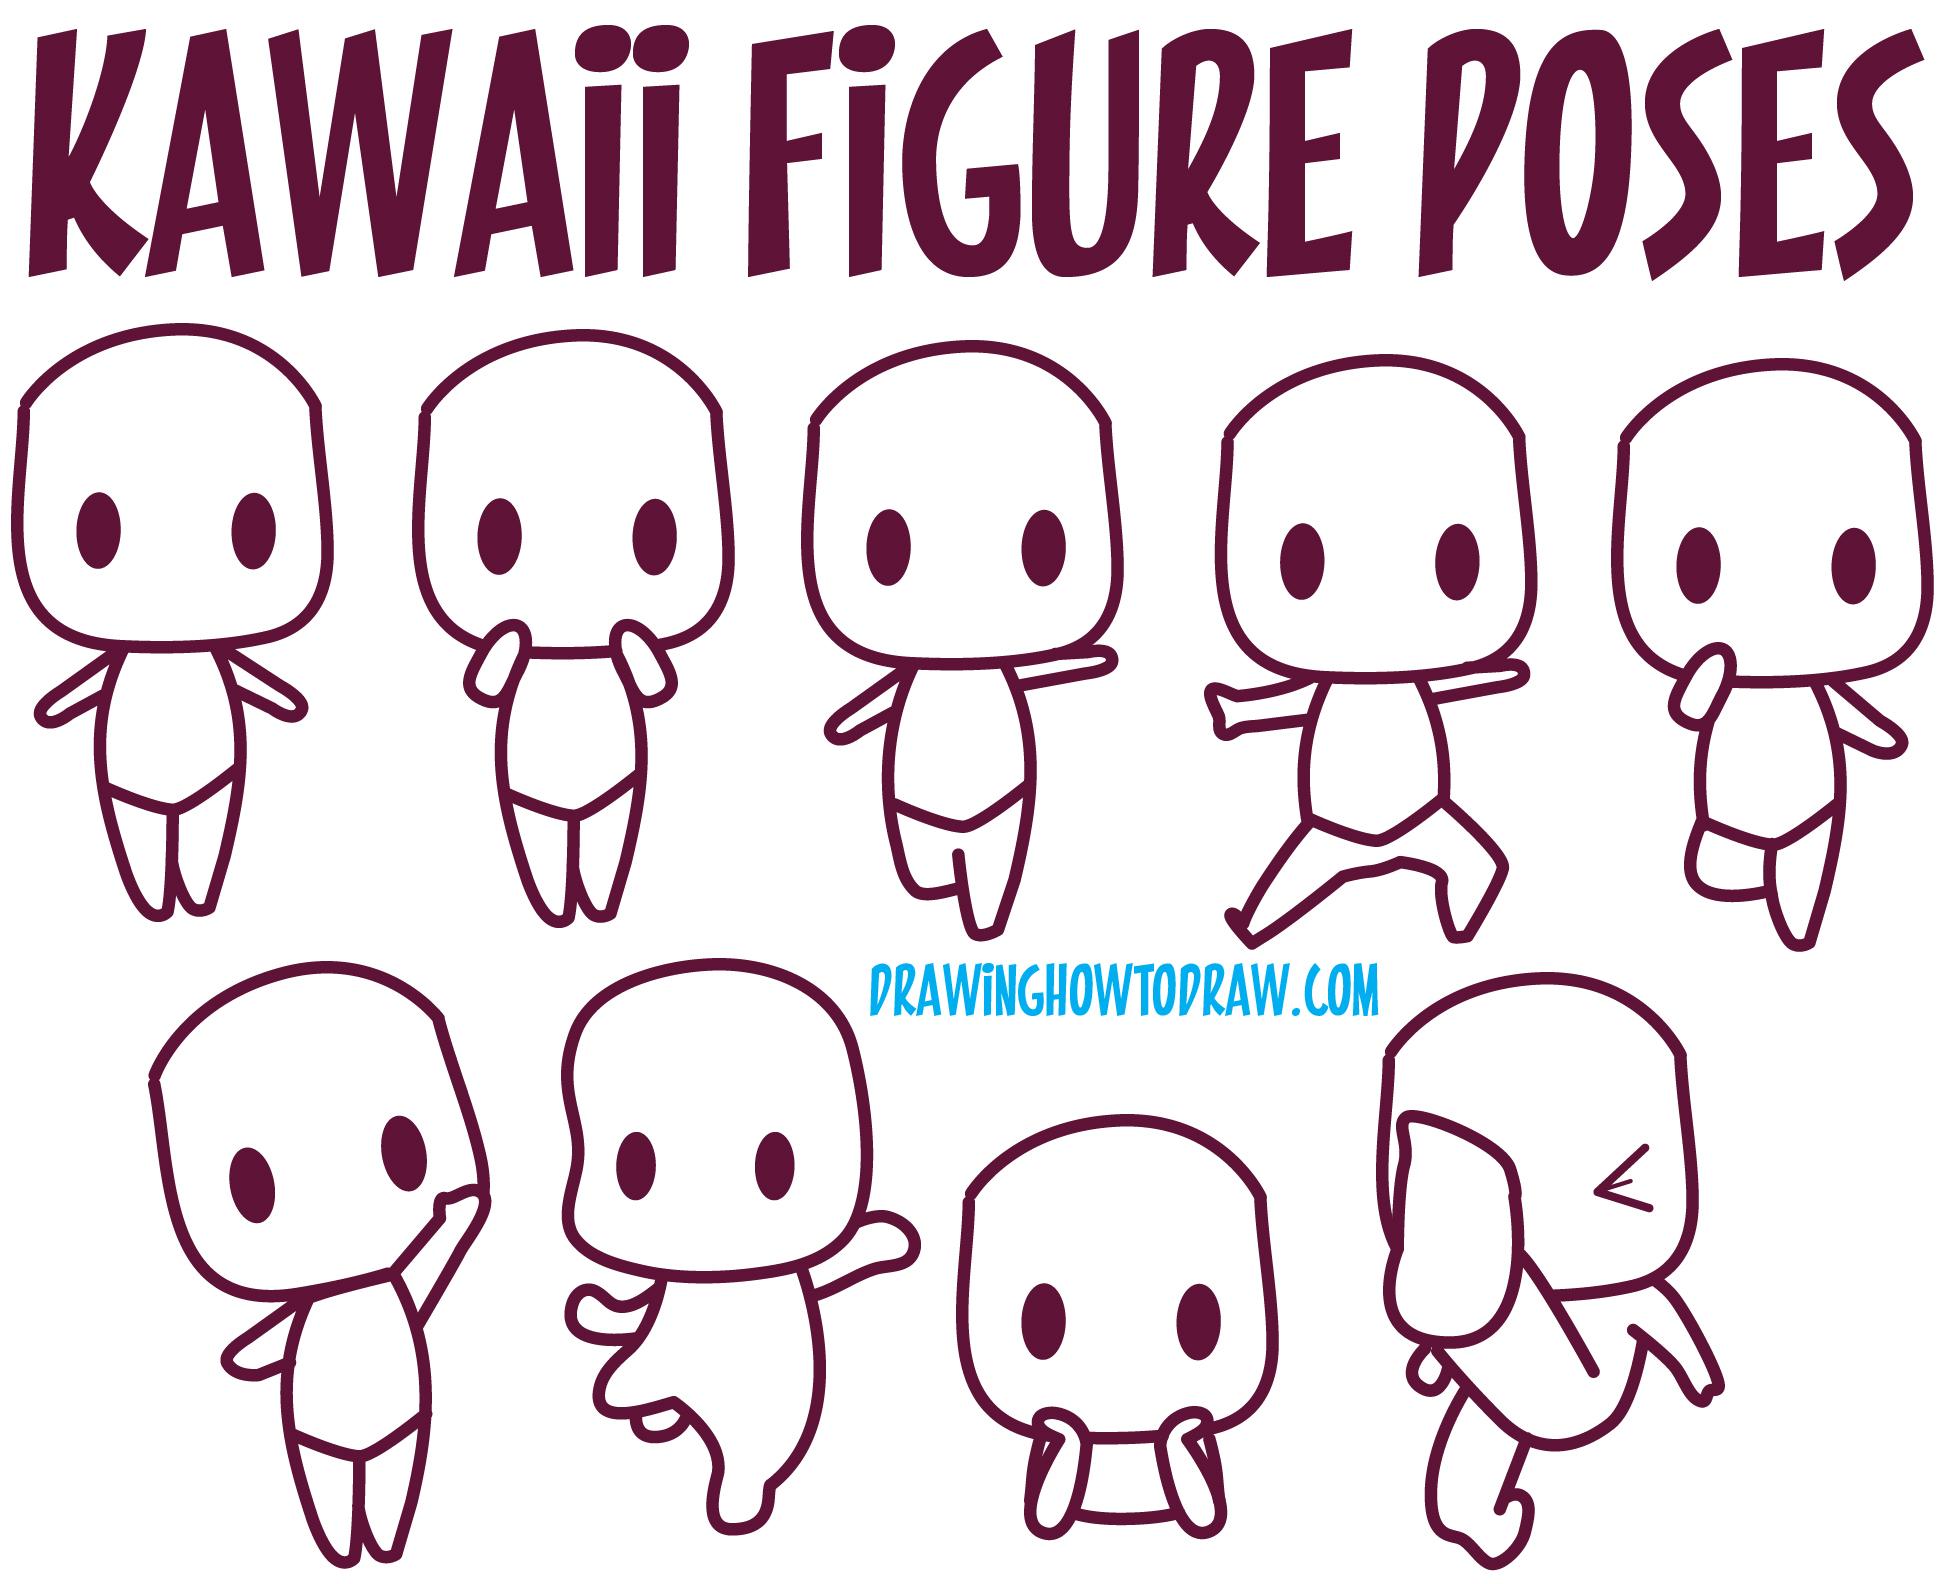 A Reference to Kawaii Bodies / Kawaii Body Poses